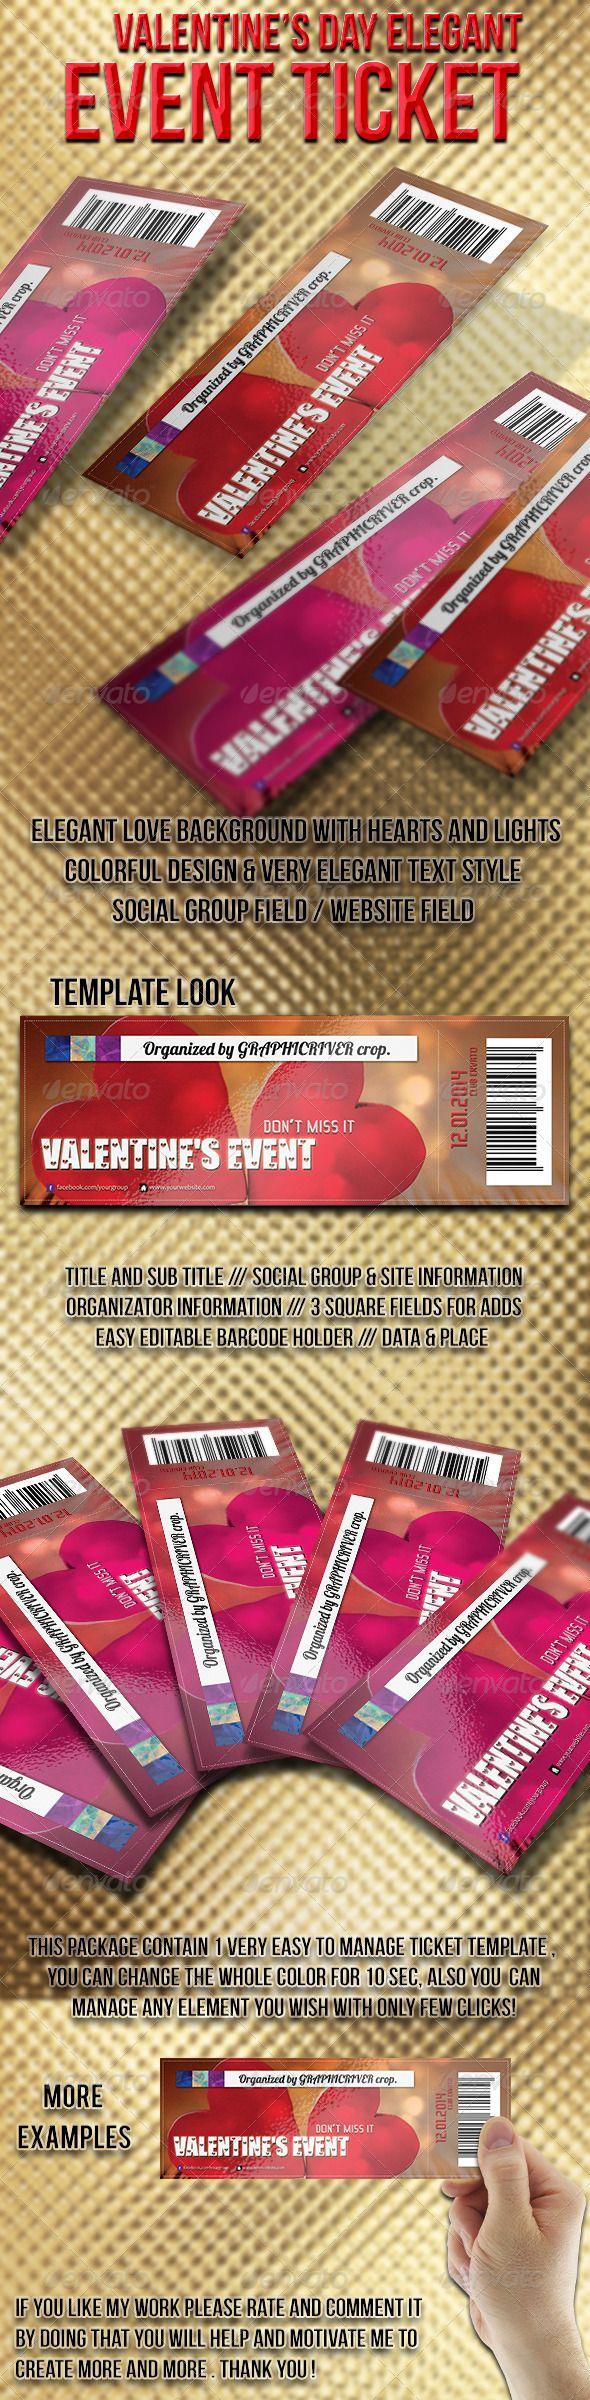 valentine pictures print color